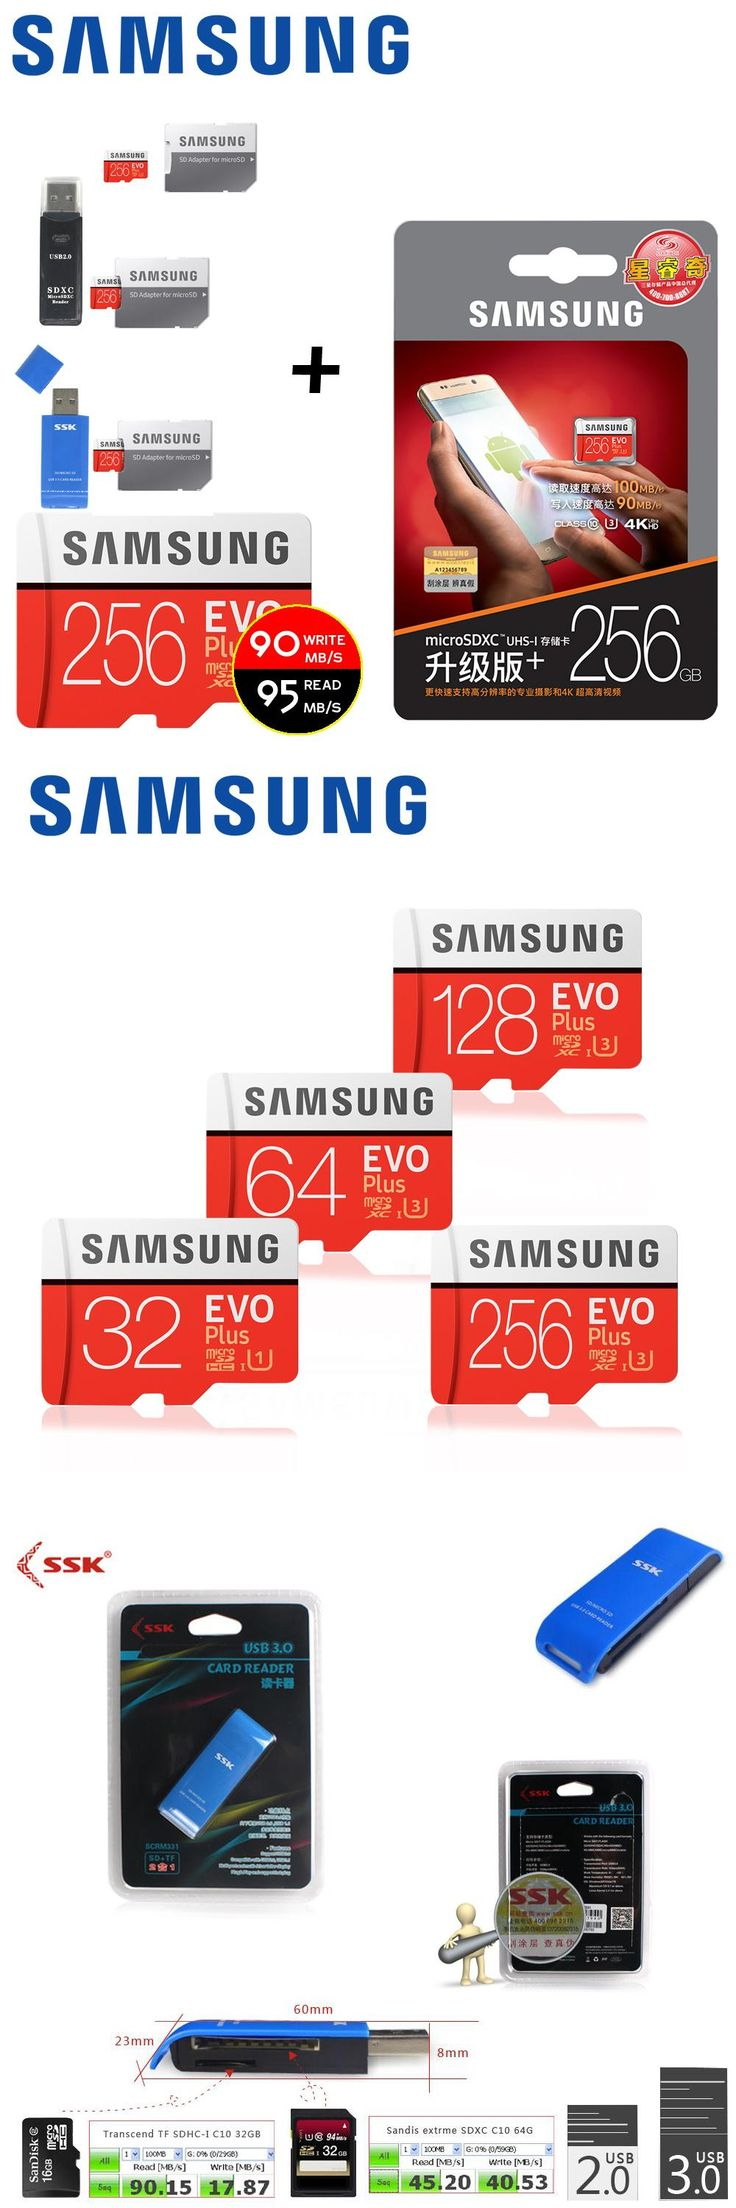 [Visit to Buy] SAMSUNG Micro SD Card 128GB 64gb 32gb 256gb 100Mb/s Class10 U3 Microsd Memory Card Flash TF Card for Phone with Mini SDHC SDXC #Advertisement